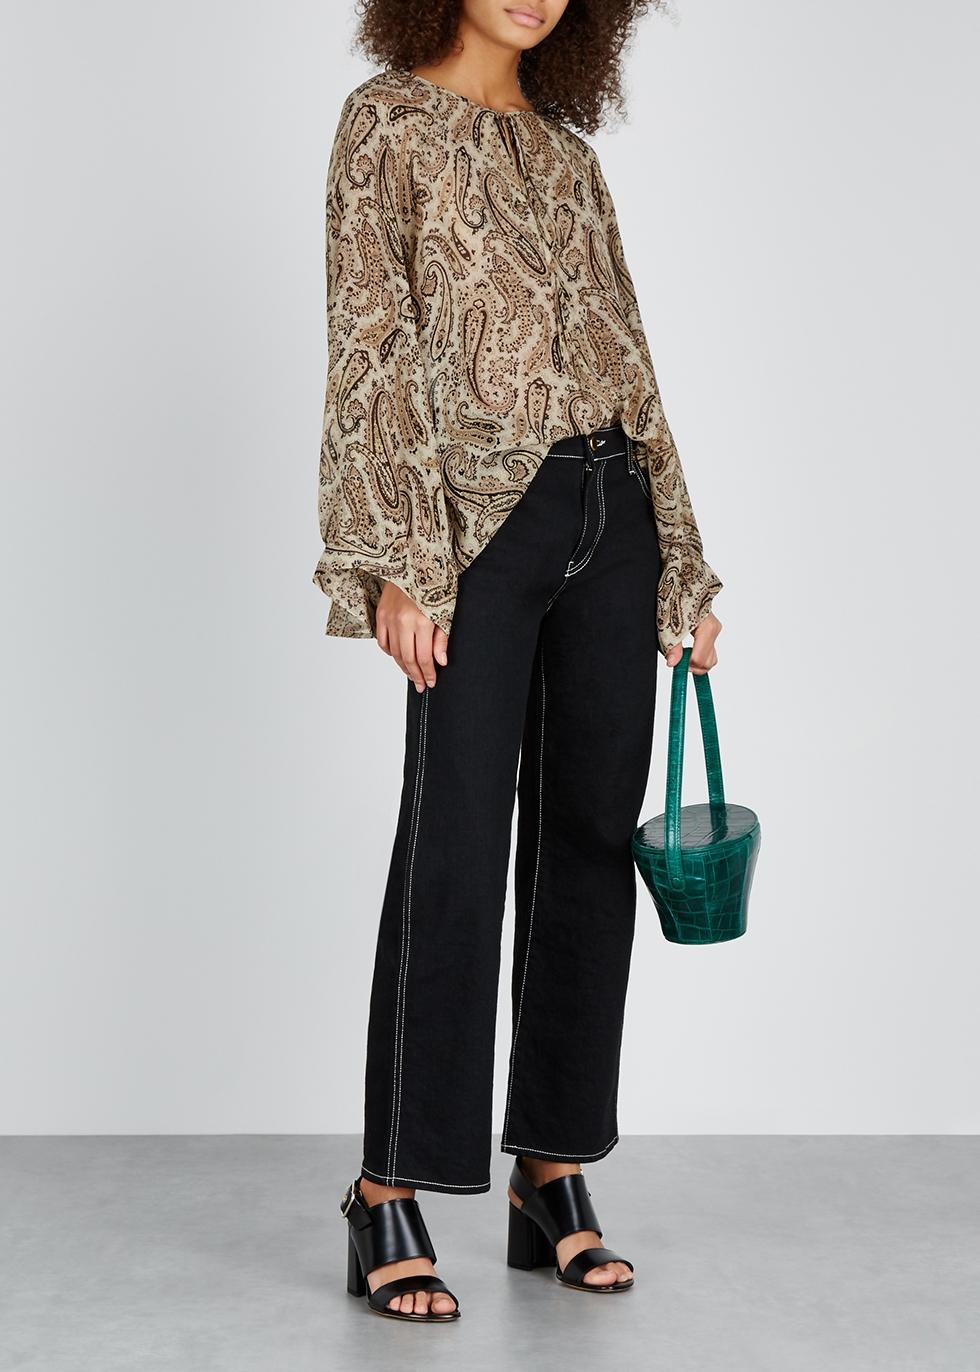 Acadia printed silk-chiffon blouse - Nili Lotan